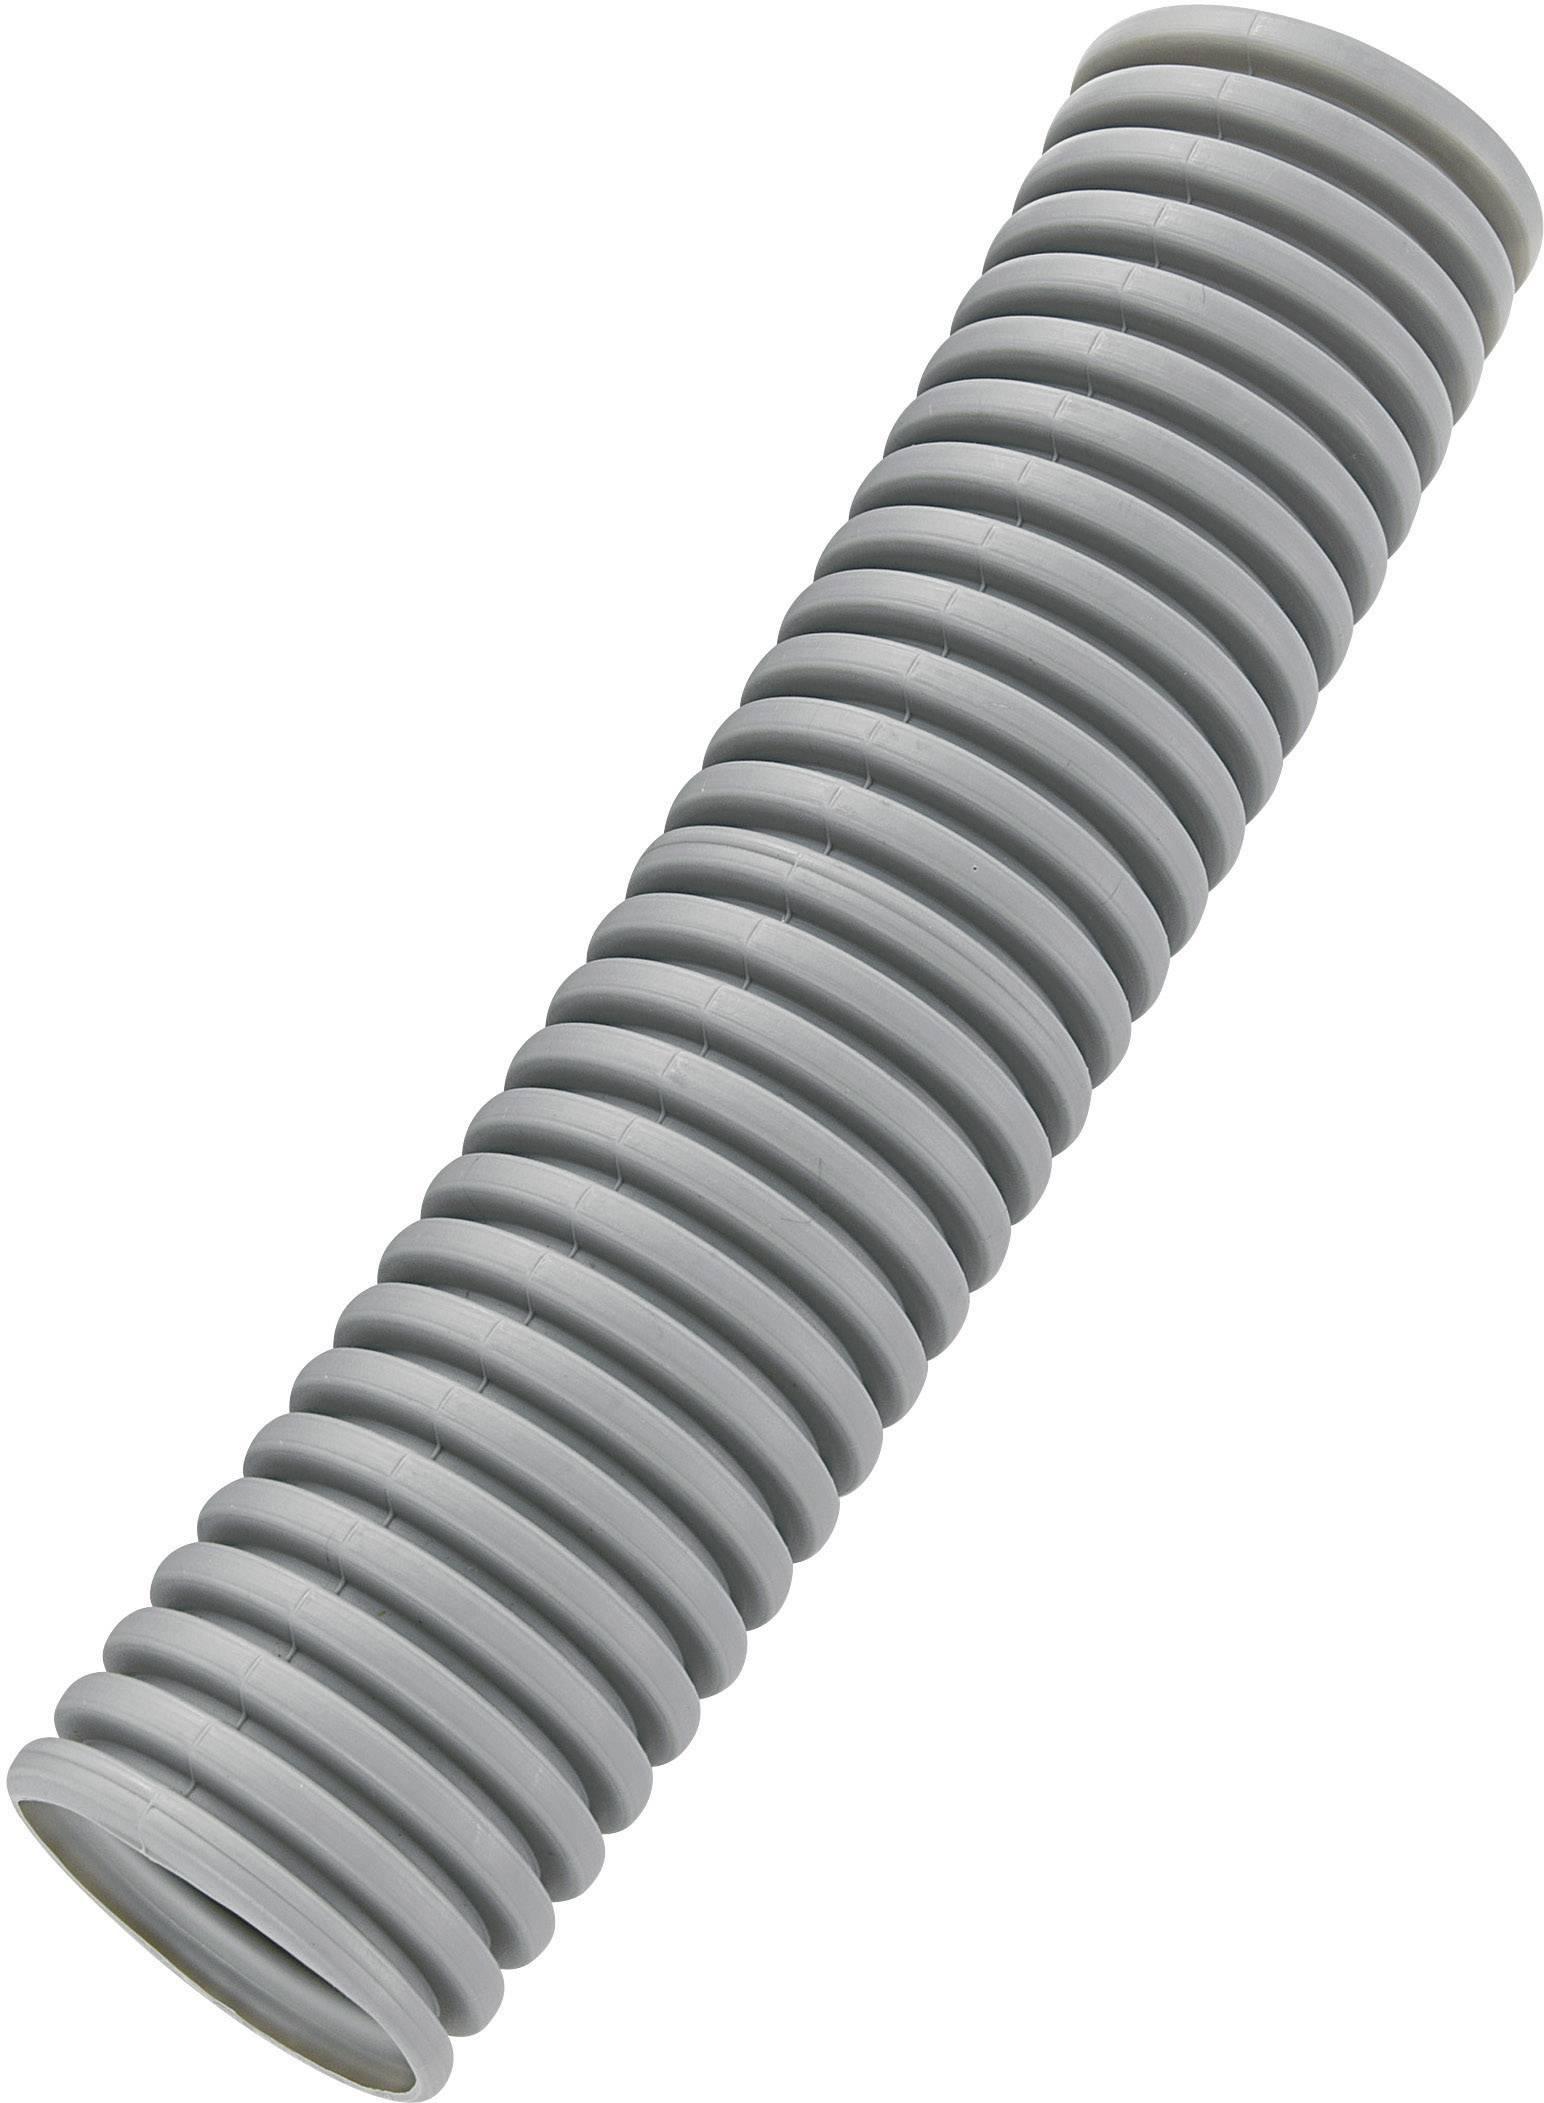 Husí krk KSS BGR32P, 32 mm, šedá